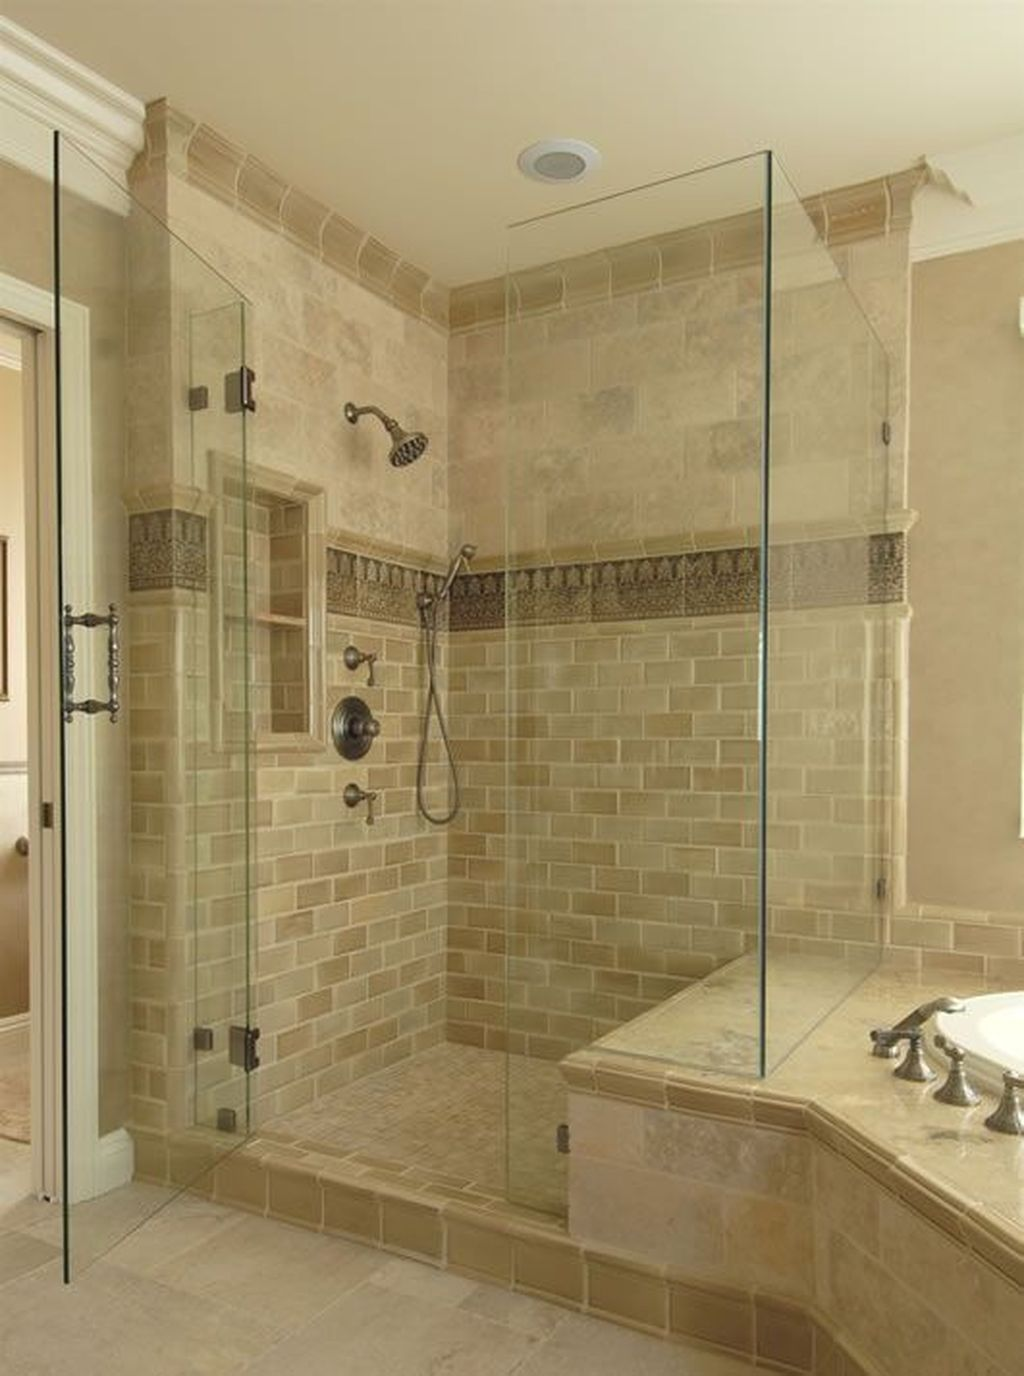 30 Beautiful Master Bathroom Remodel Design Ideas In 2020 Bathroom Remodel Master Bathroom Remodel Designs Bathrooms Remodel